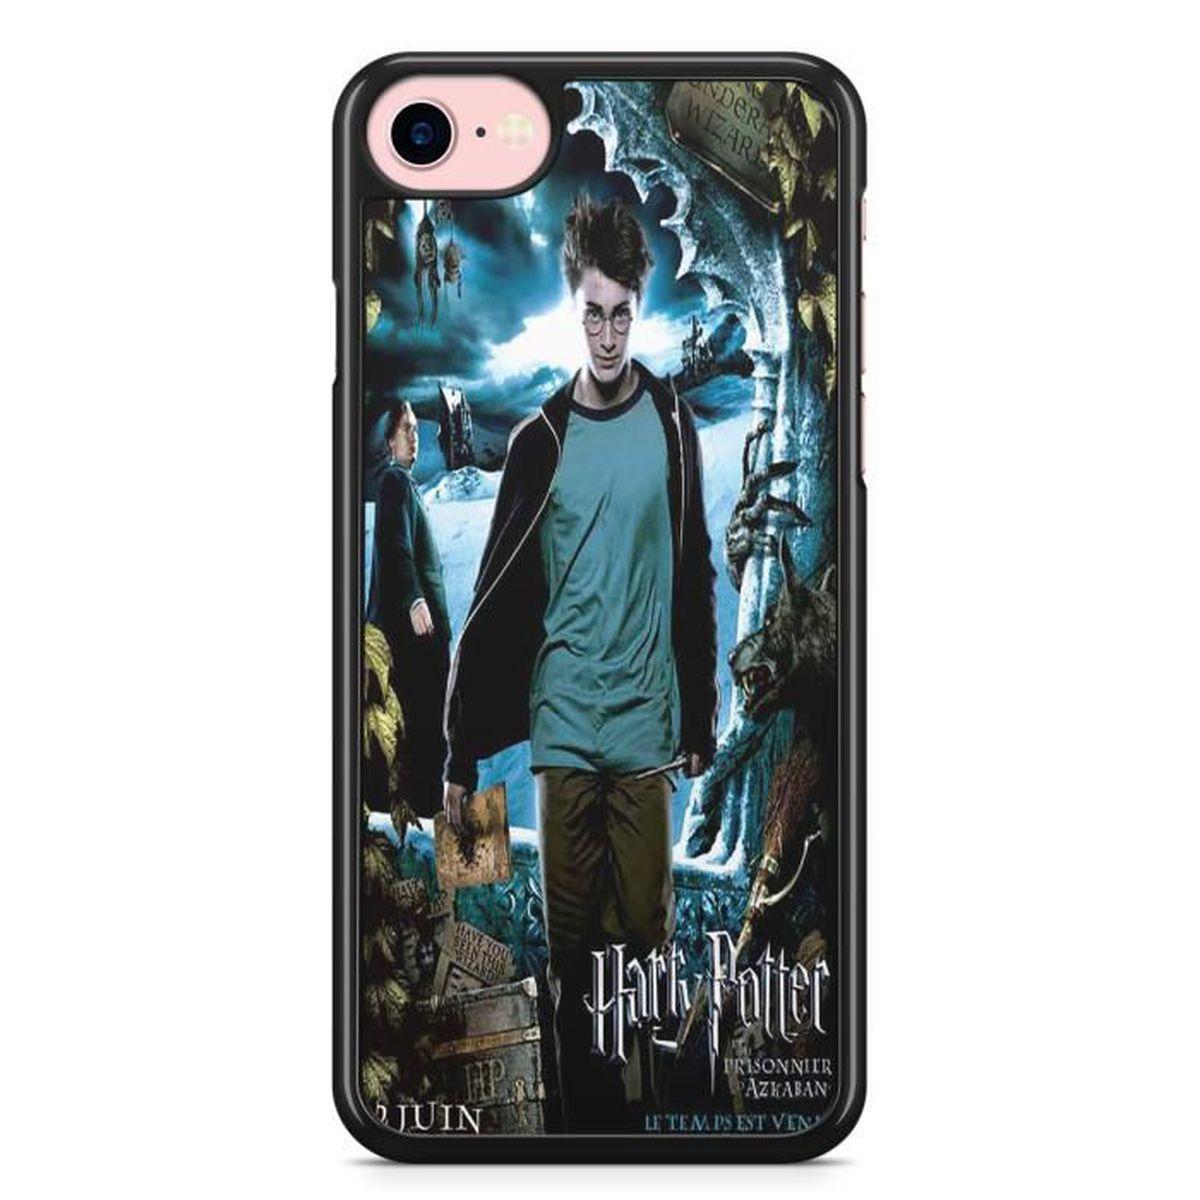 Coque Iphone 6 6S Harry Potter film etui housse